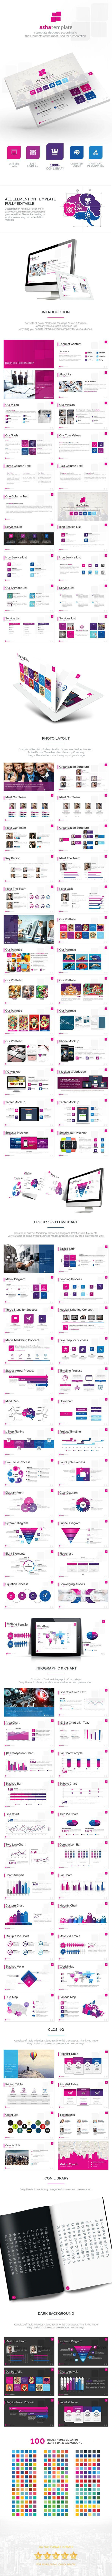 Asha - Business Powerpoint Template #slides Download: http://graphicriver.net/item/asha-business-powerpoint-template/13397598?ref=ksioks